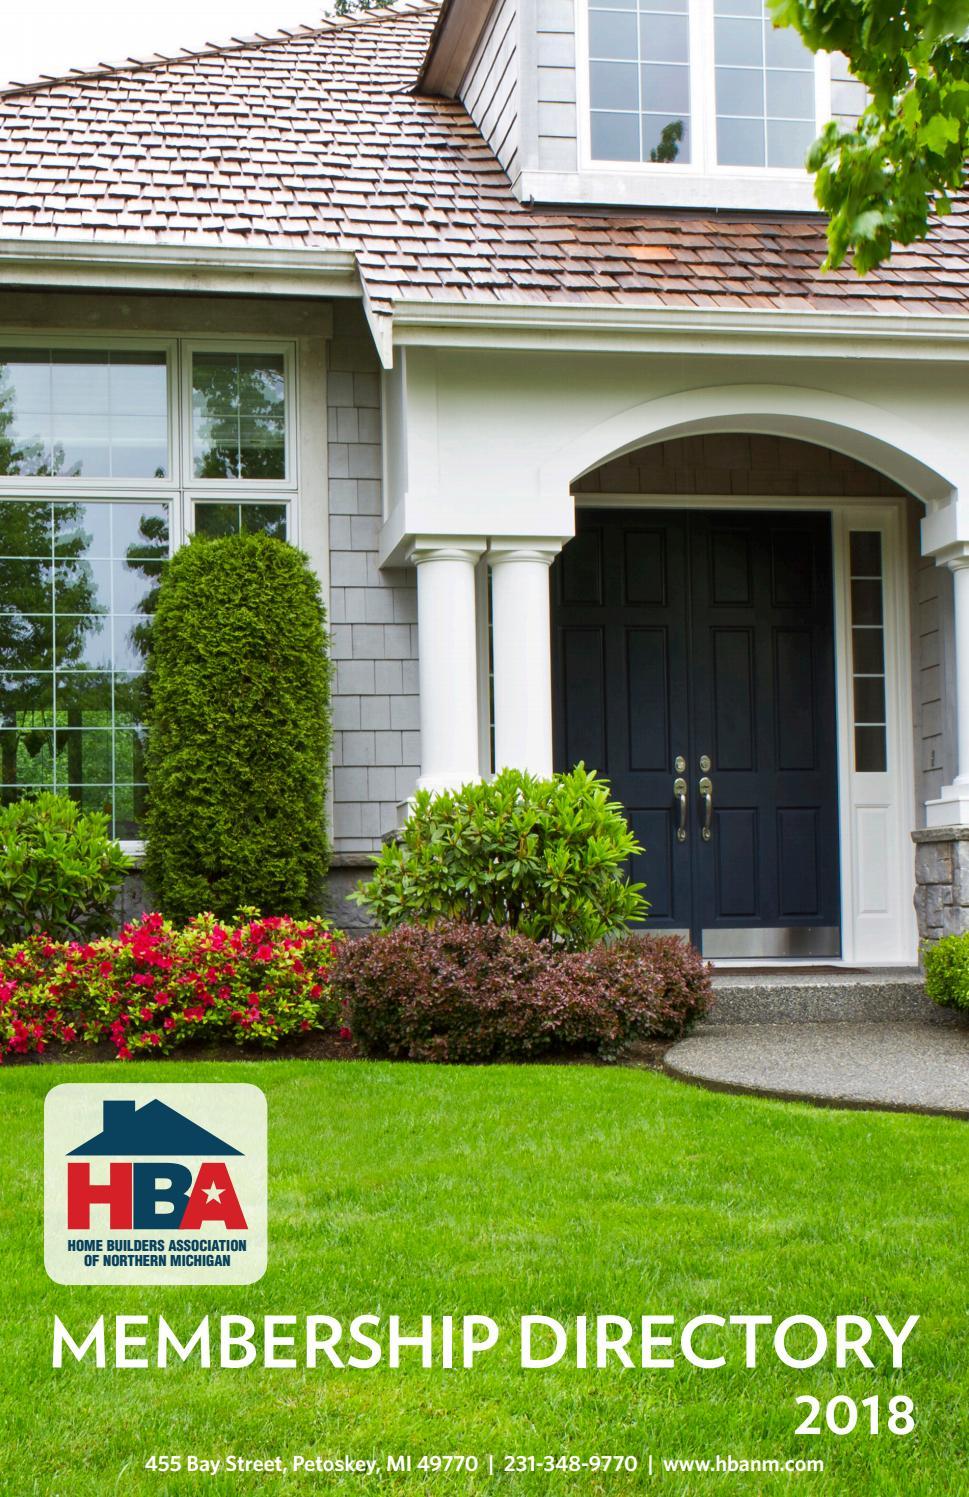 Home Builders Association of Northern Michigan 2018 Membership